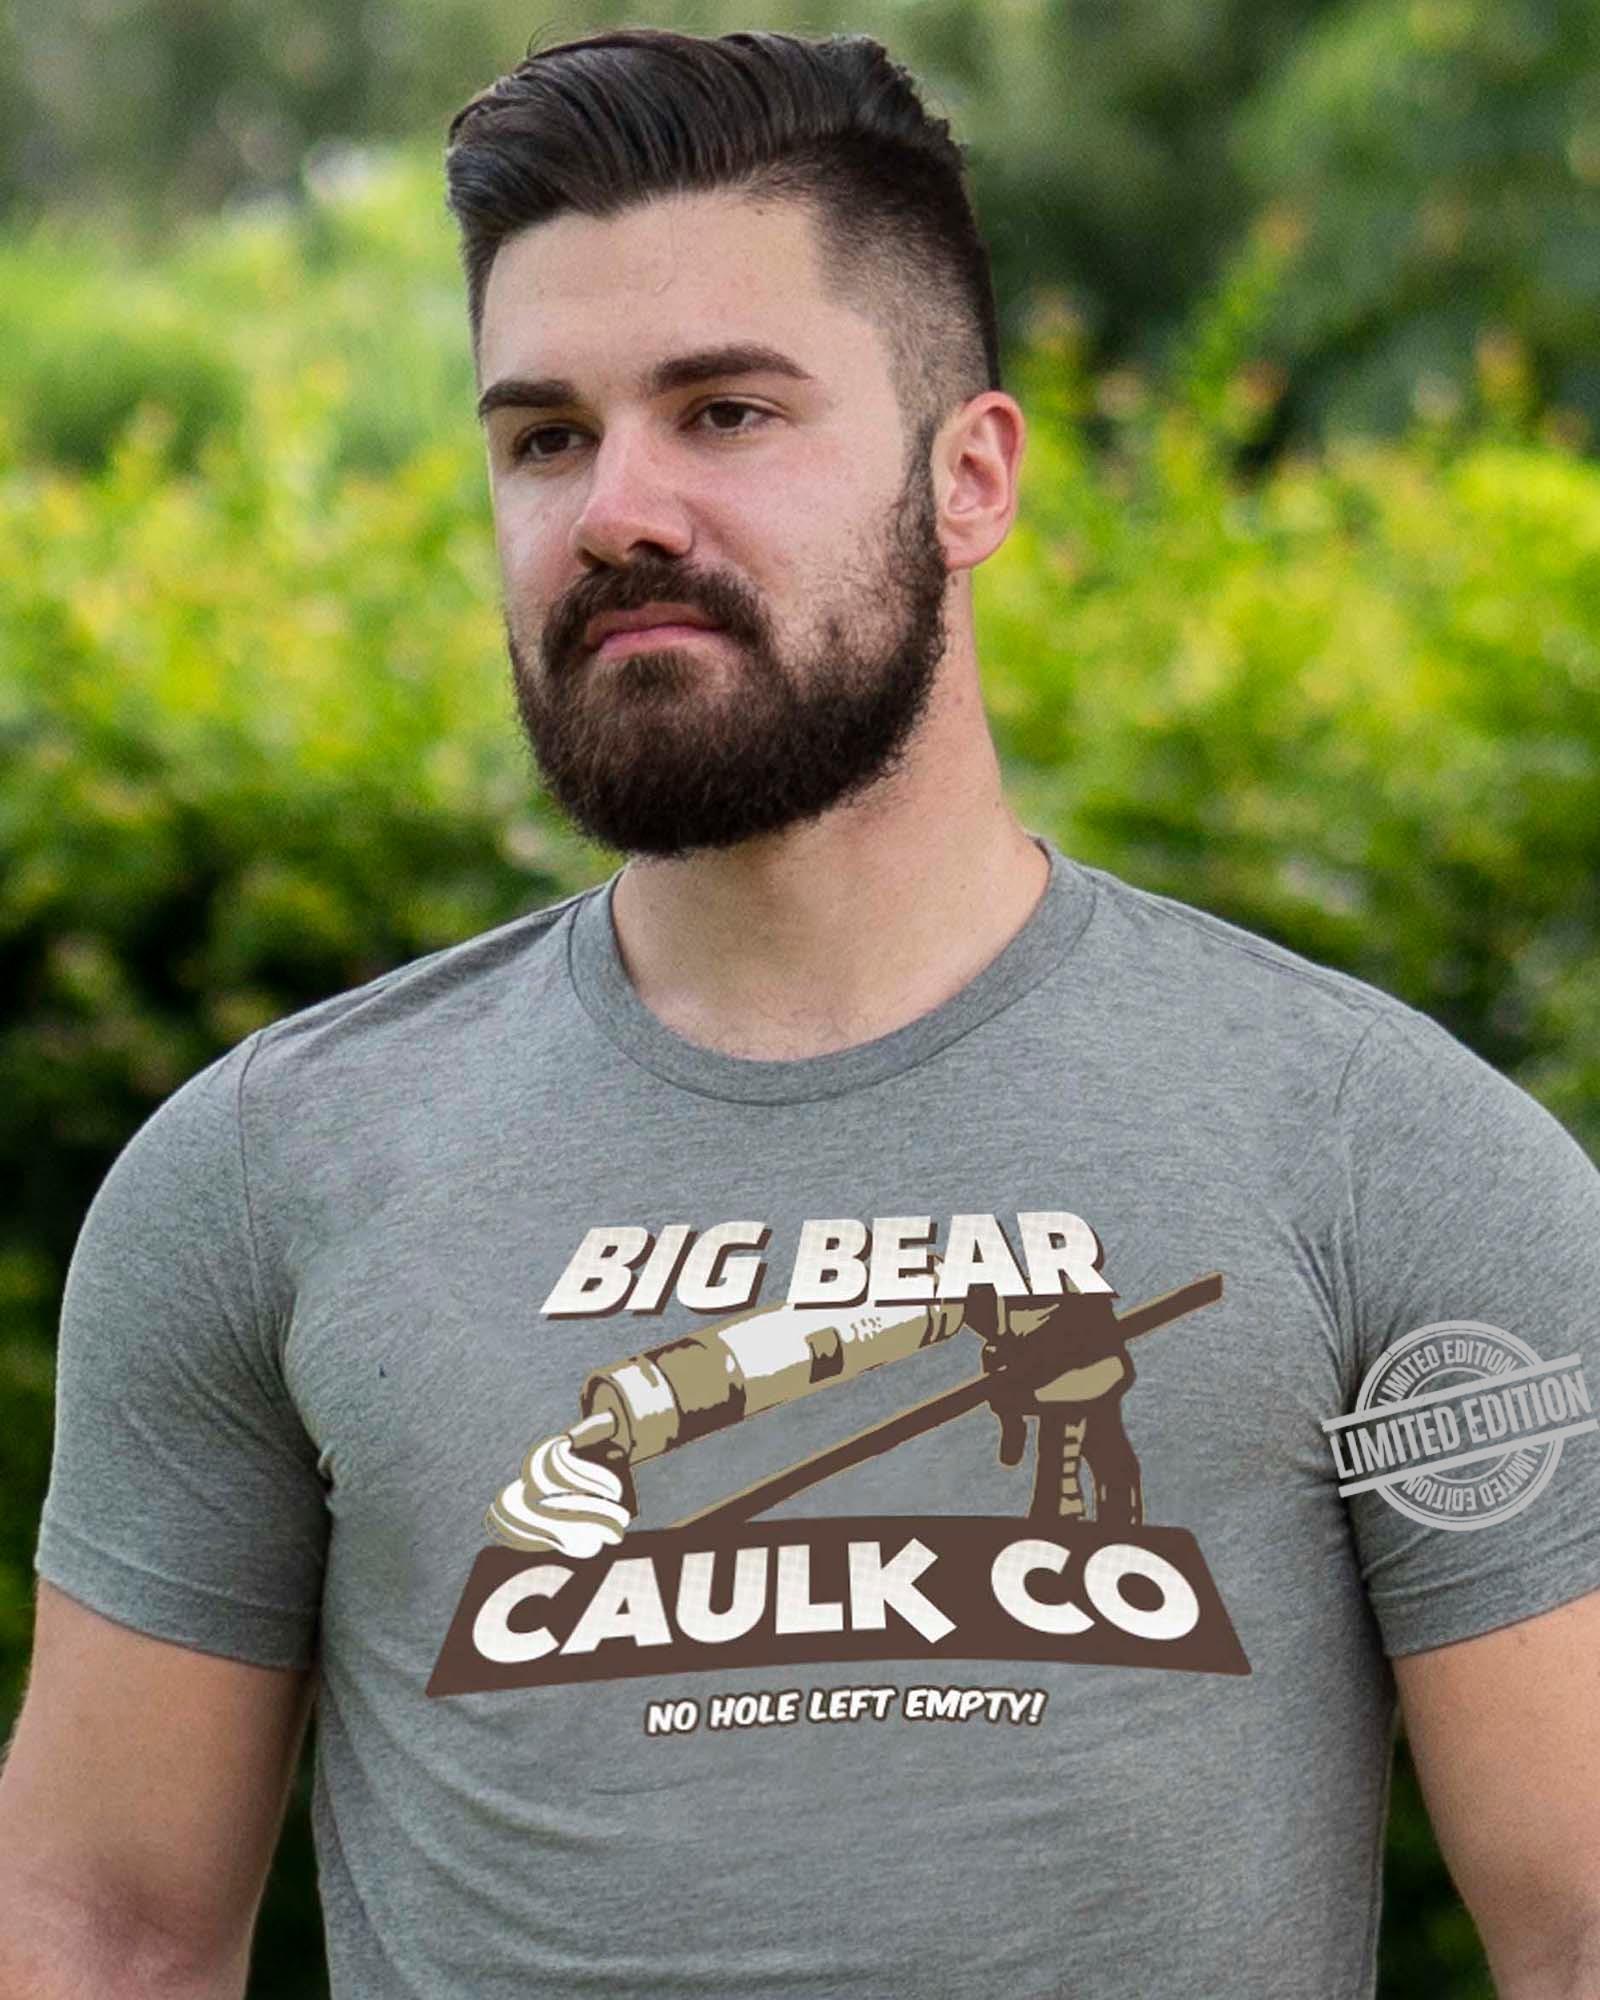 Big Bear Caulk Co No Hole Left Empty Shirt